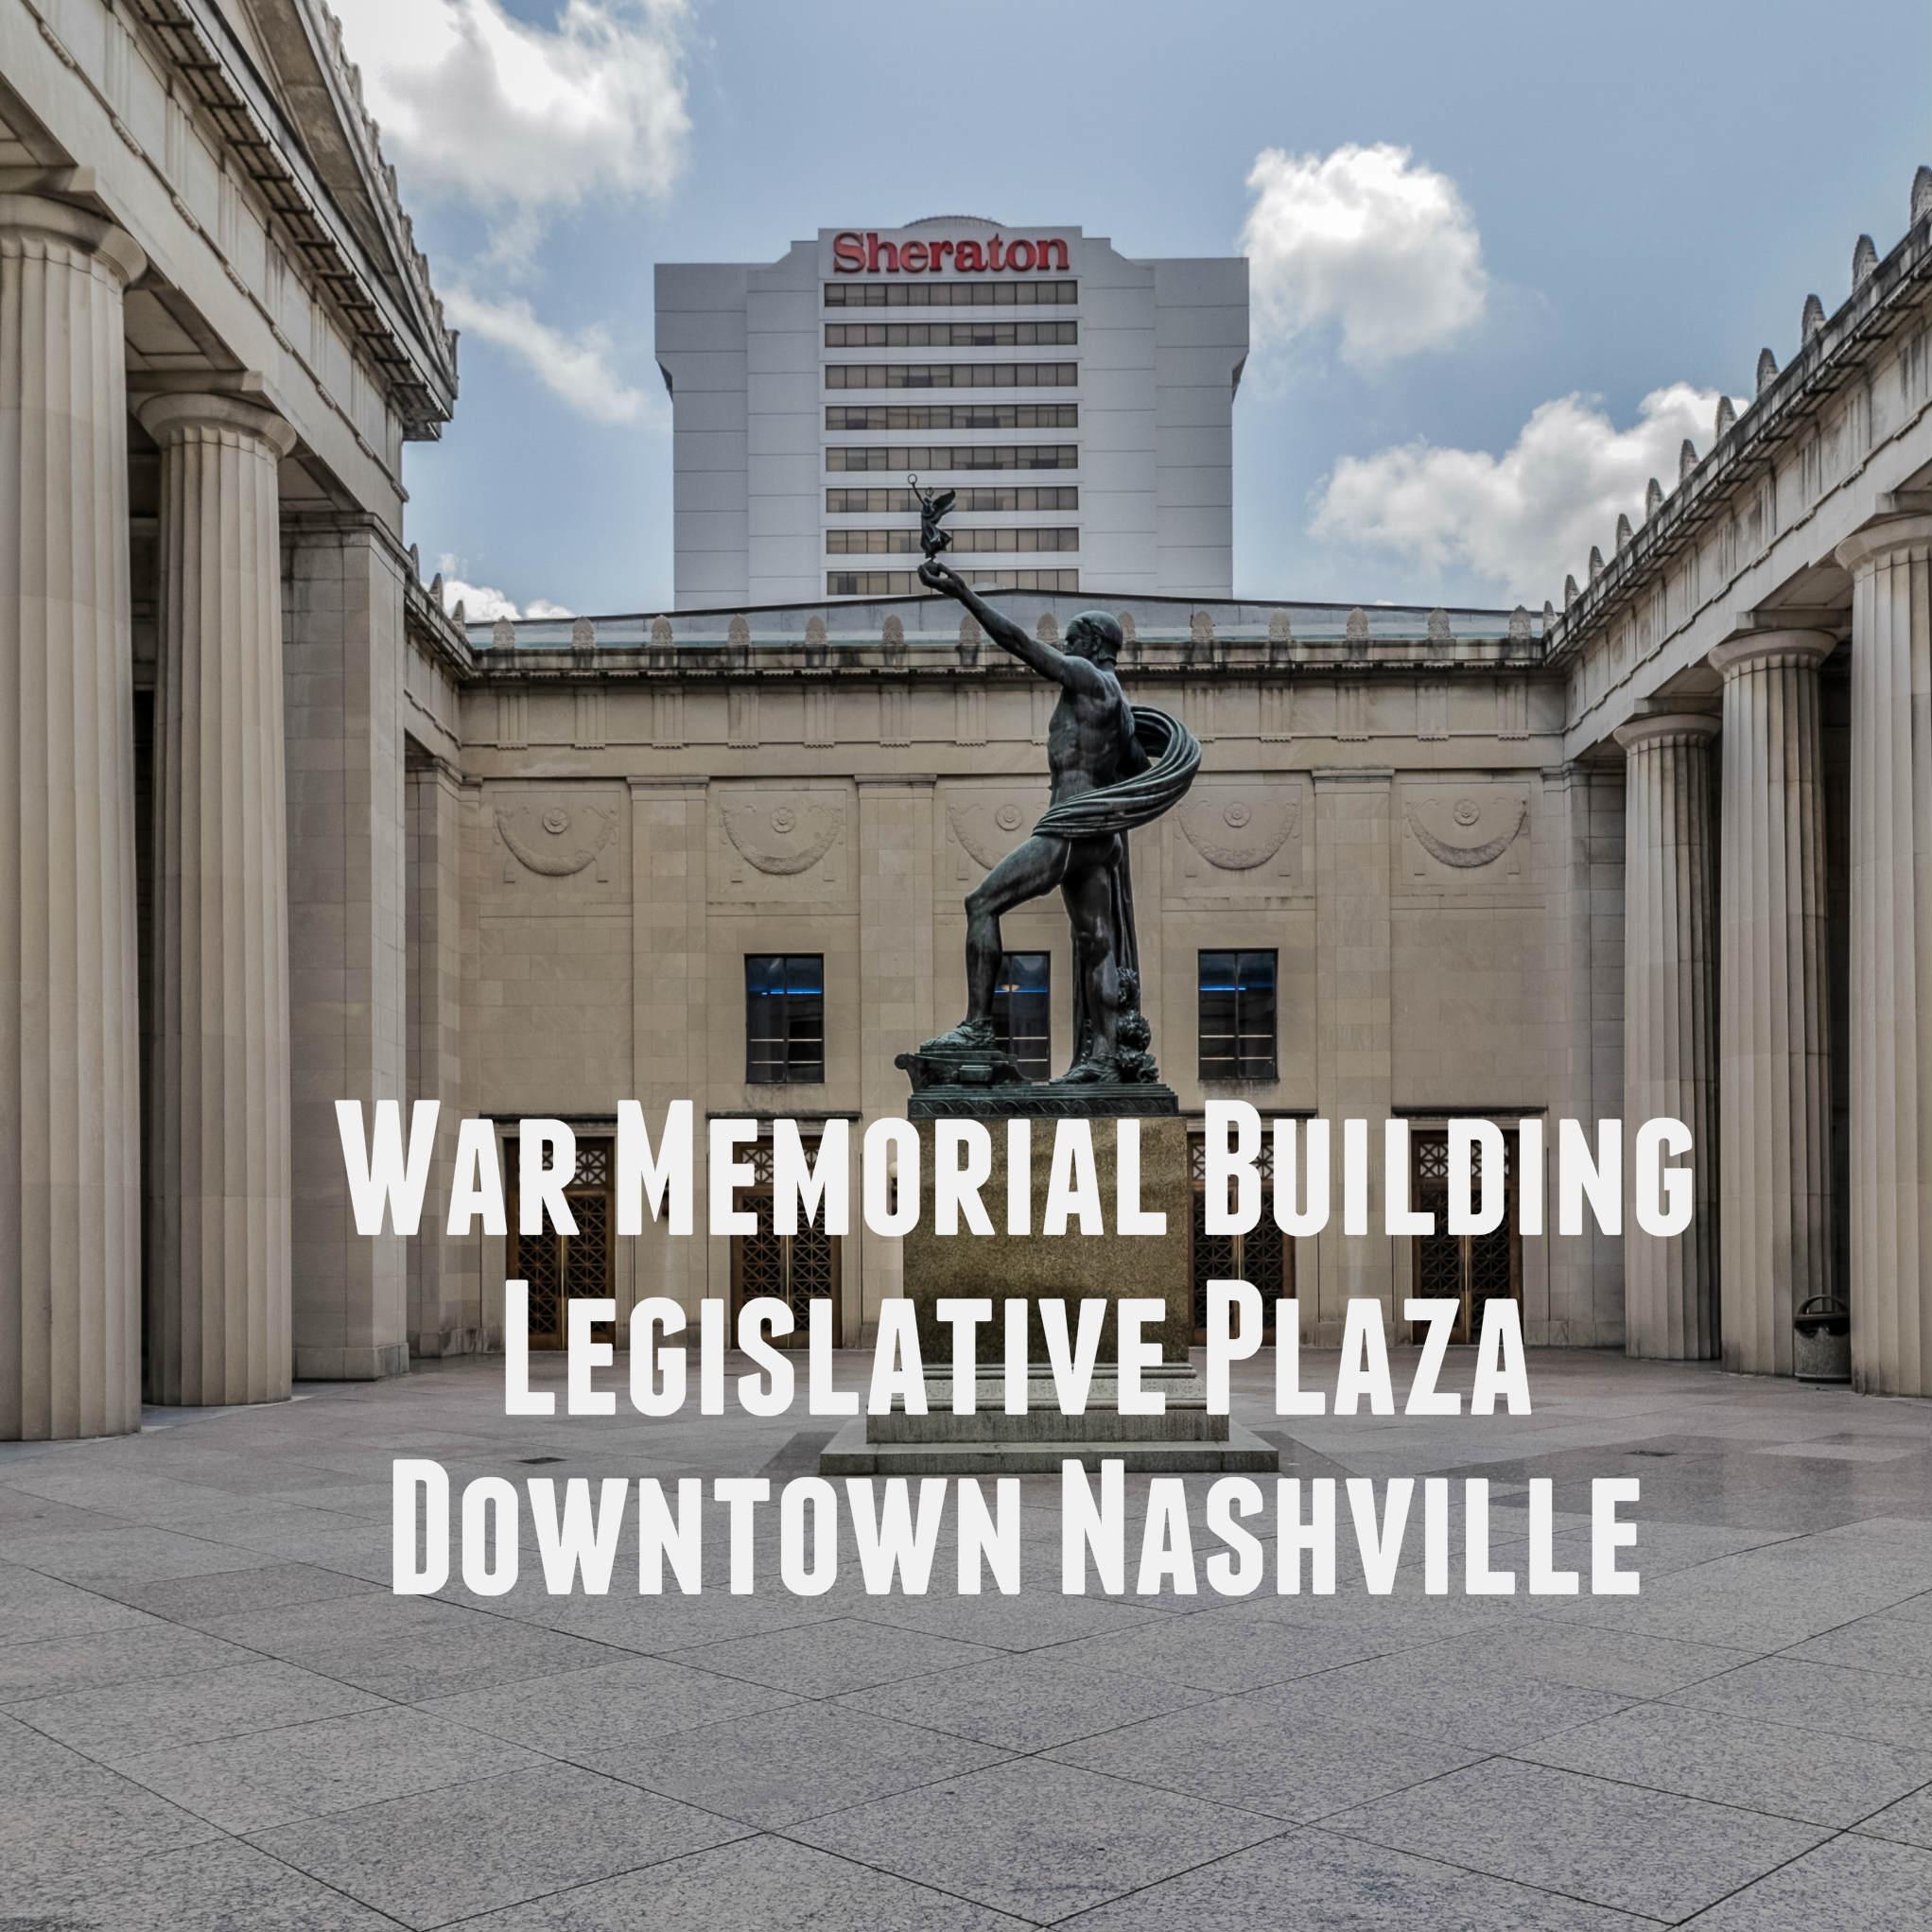 War Memorial Building Legislative Plaza Downtown Nashville